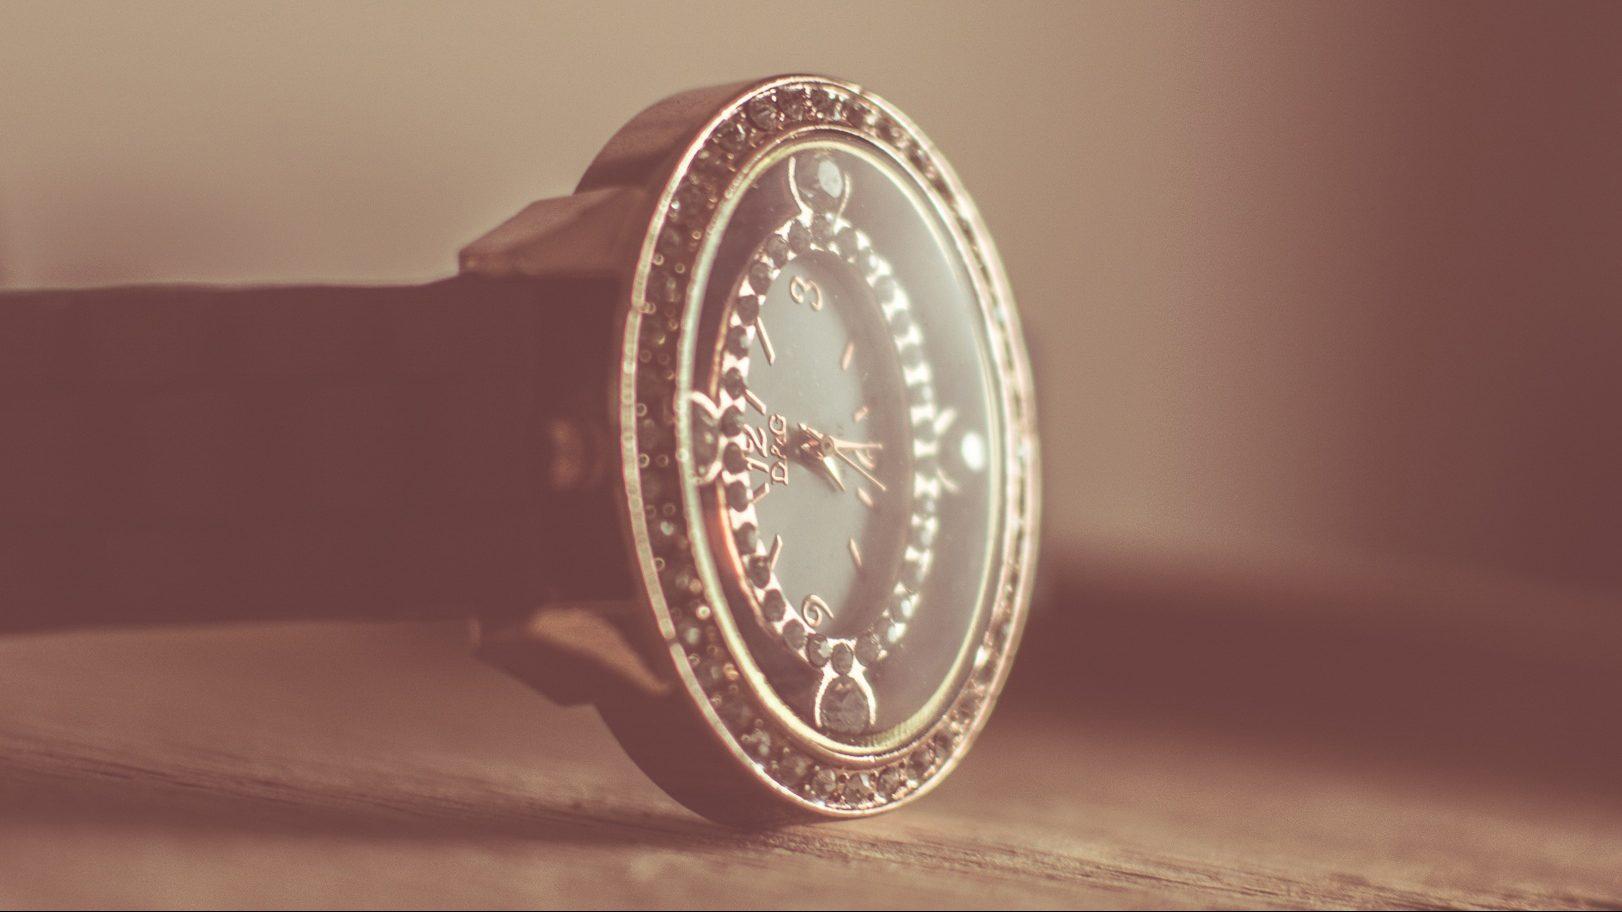 Die alte Ruhla-Armbanduhr